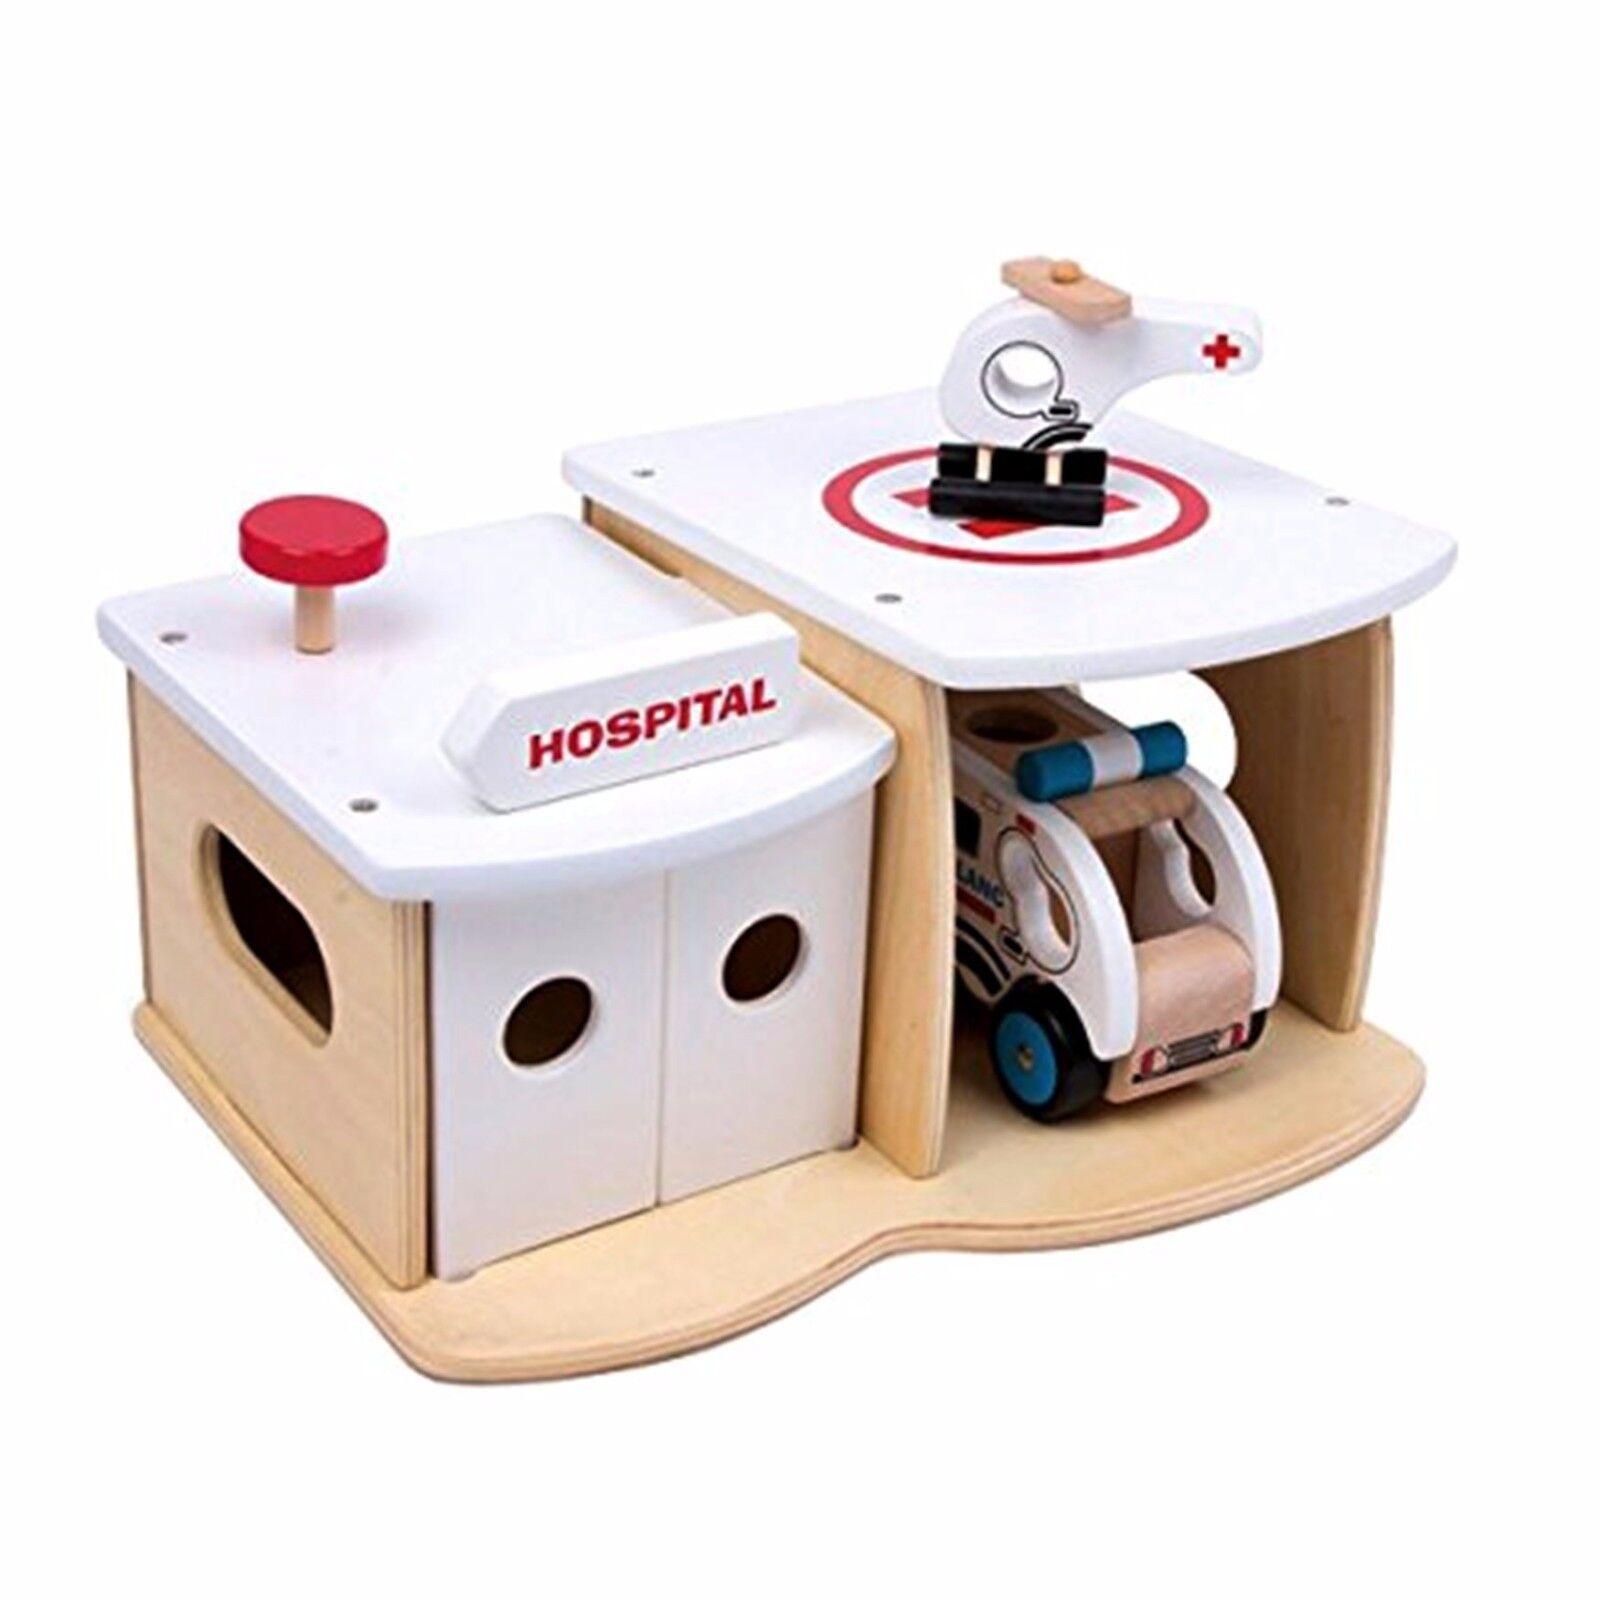 Toy Hospital Toy Ambulance Toy Hospital Toys Rescue Hospital Toys